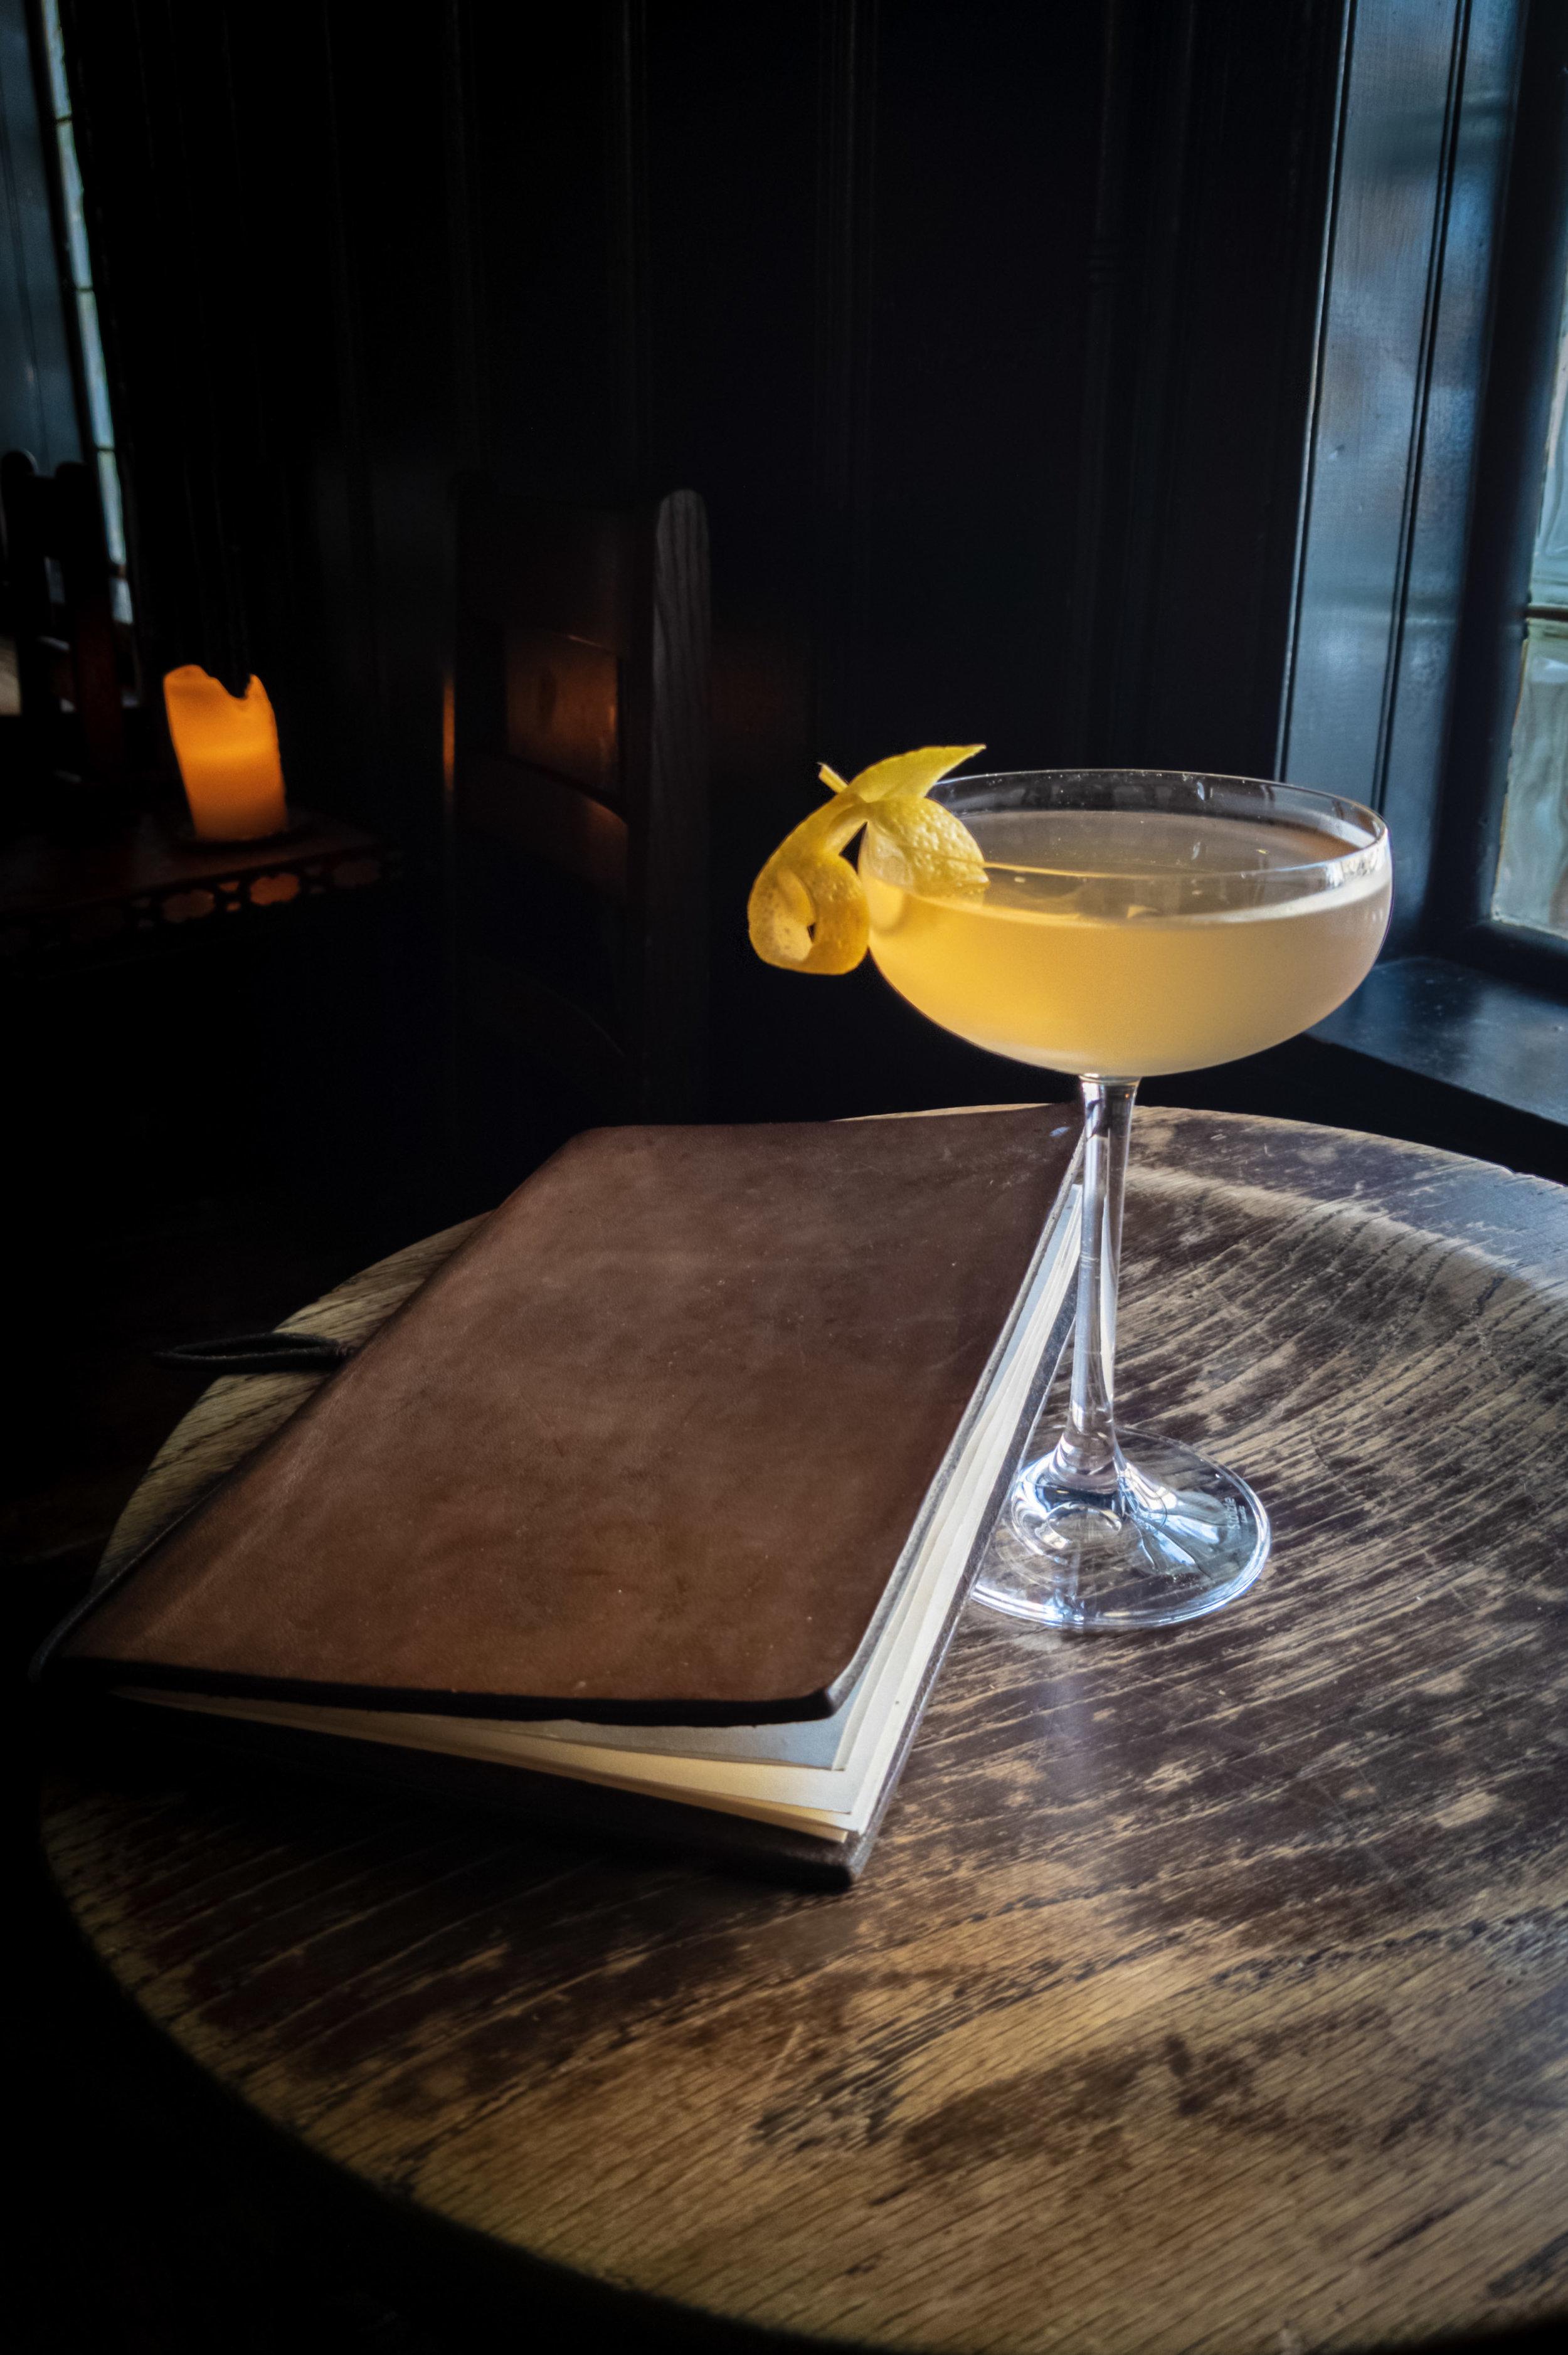 Bond Girl cocktail, courtesy Baltimore Spirits Co.